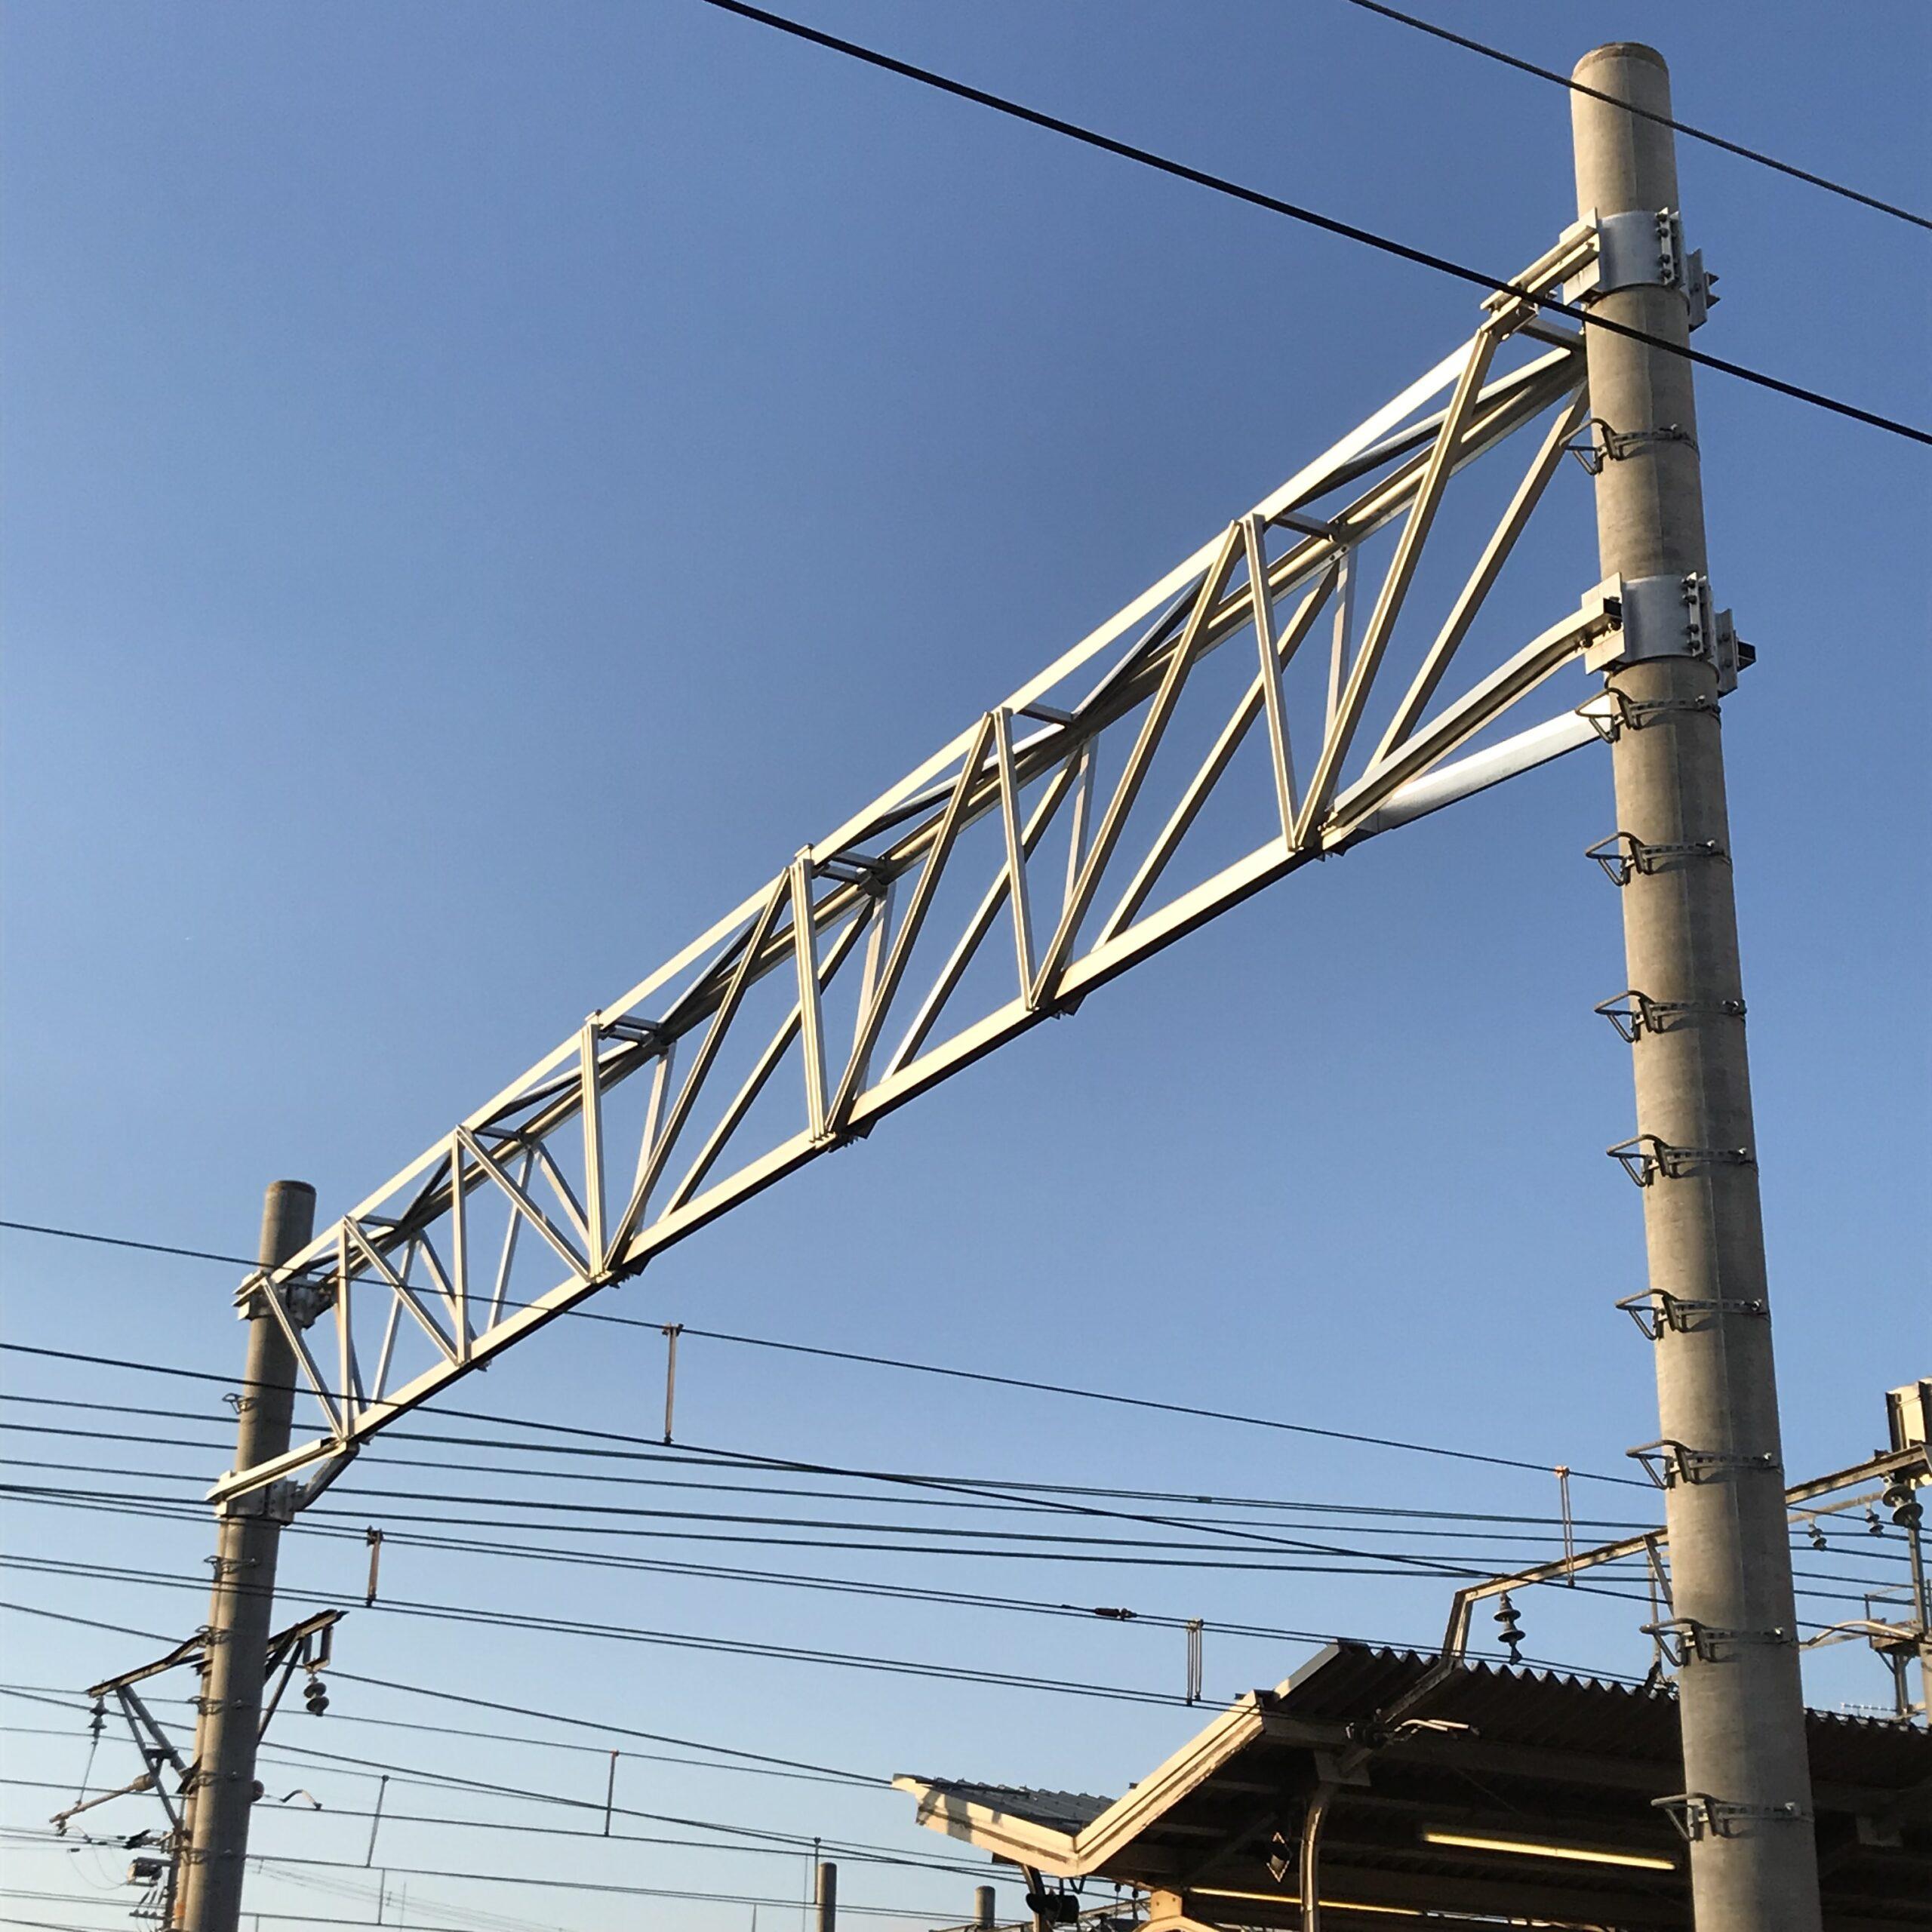 鉄道架線ビーム締結